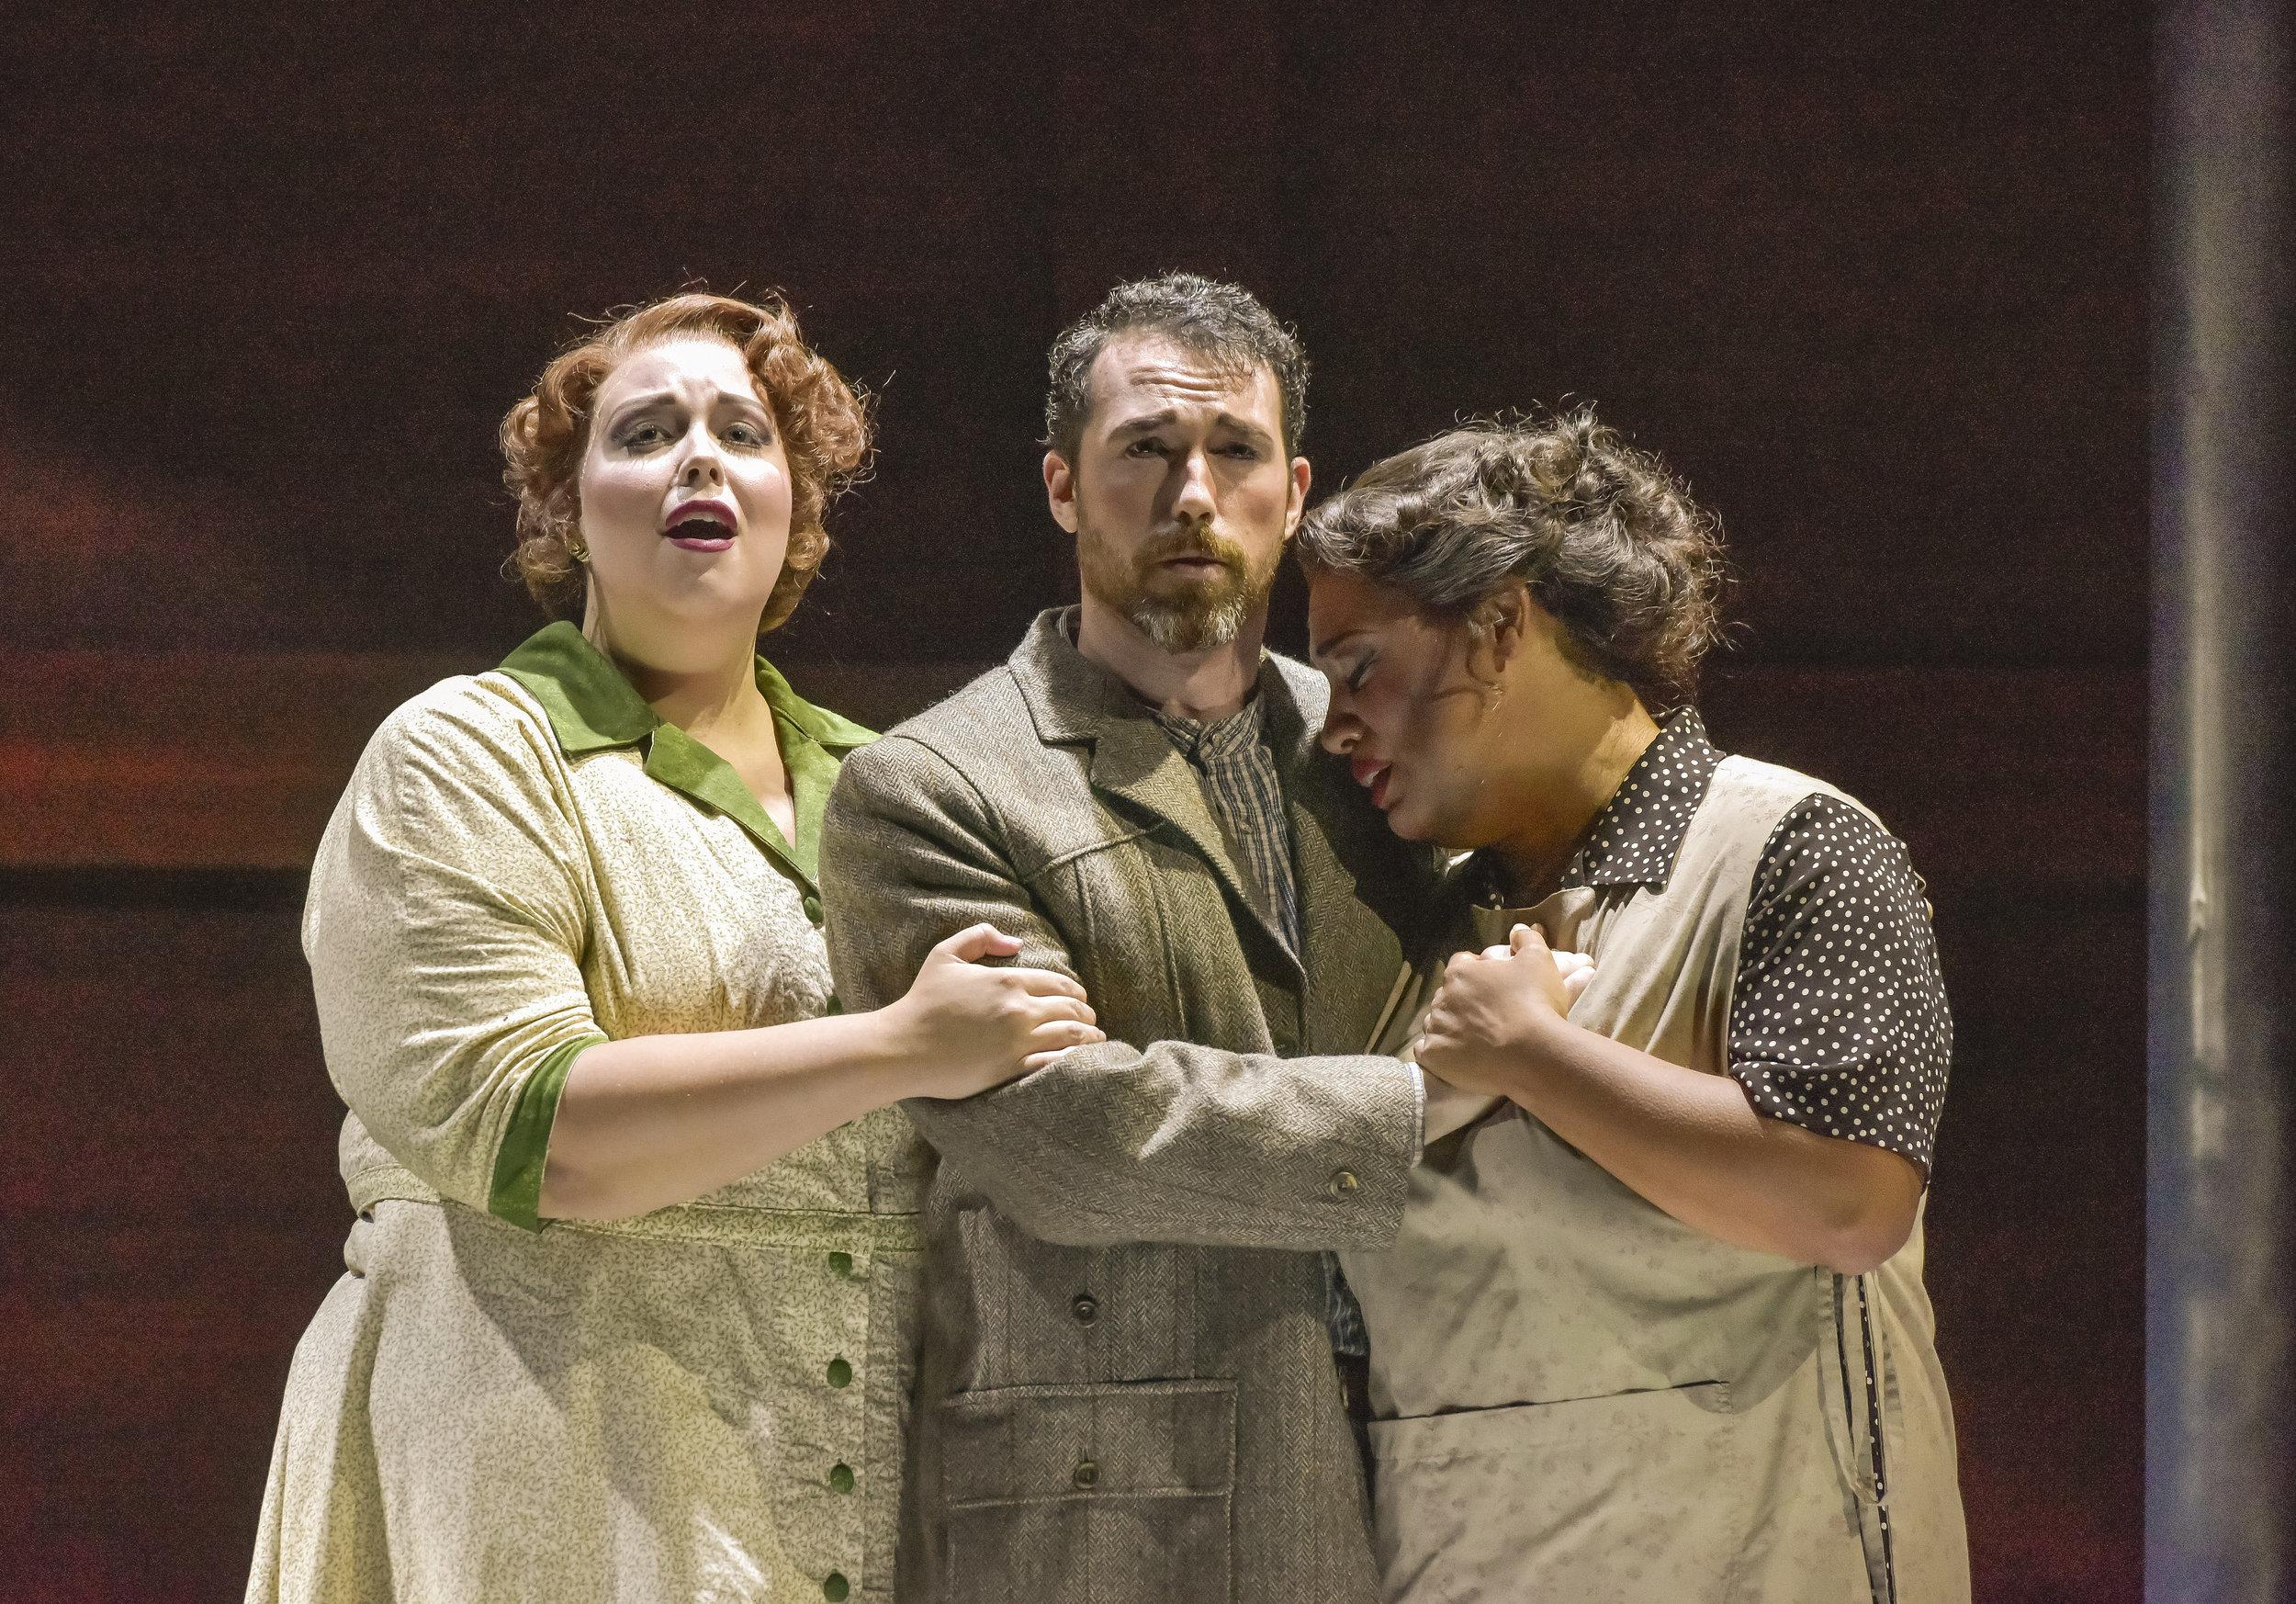 _2 Meghan Kasanders (MAGDA SOREL), Robert Wesley Mason (John Sorel), and Deborah Nansteel (Mother) in THE CONSUL.jpg